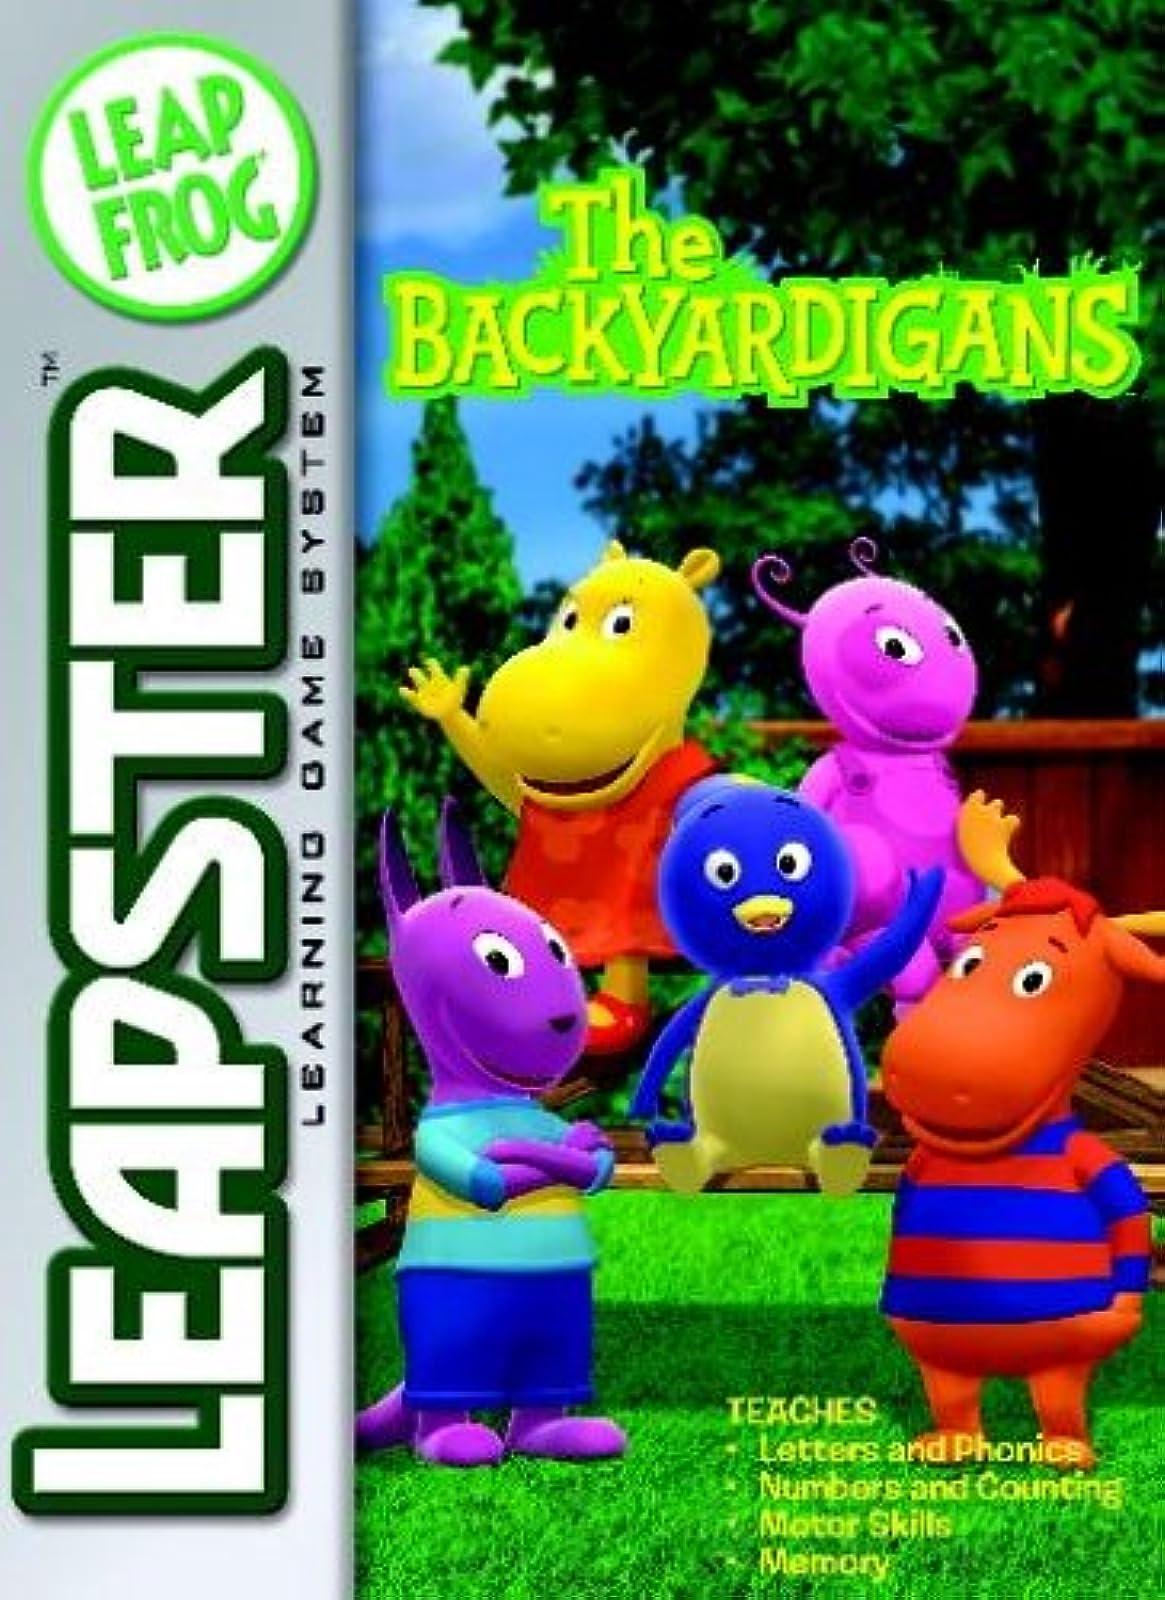 Leapfrog Leapster Learning Game Backyardigans For Leap Frog Arcade